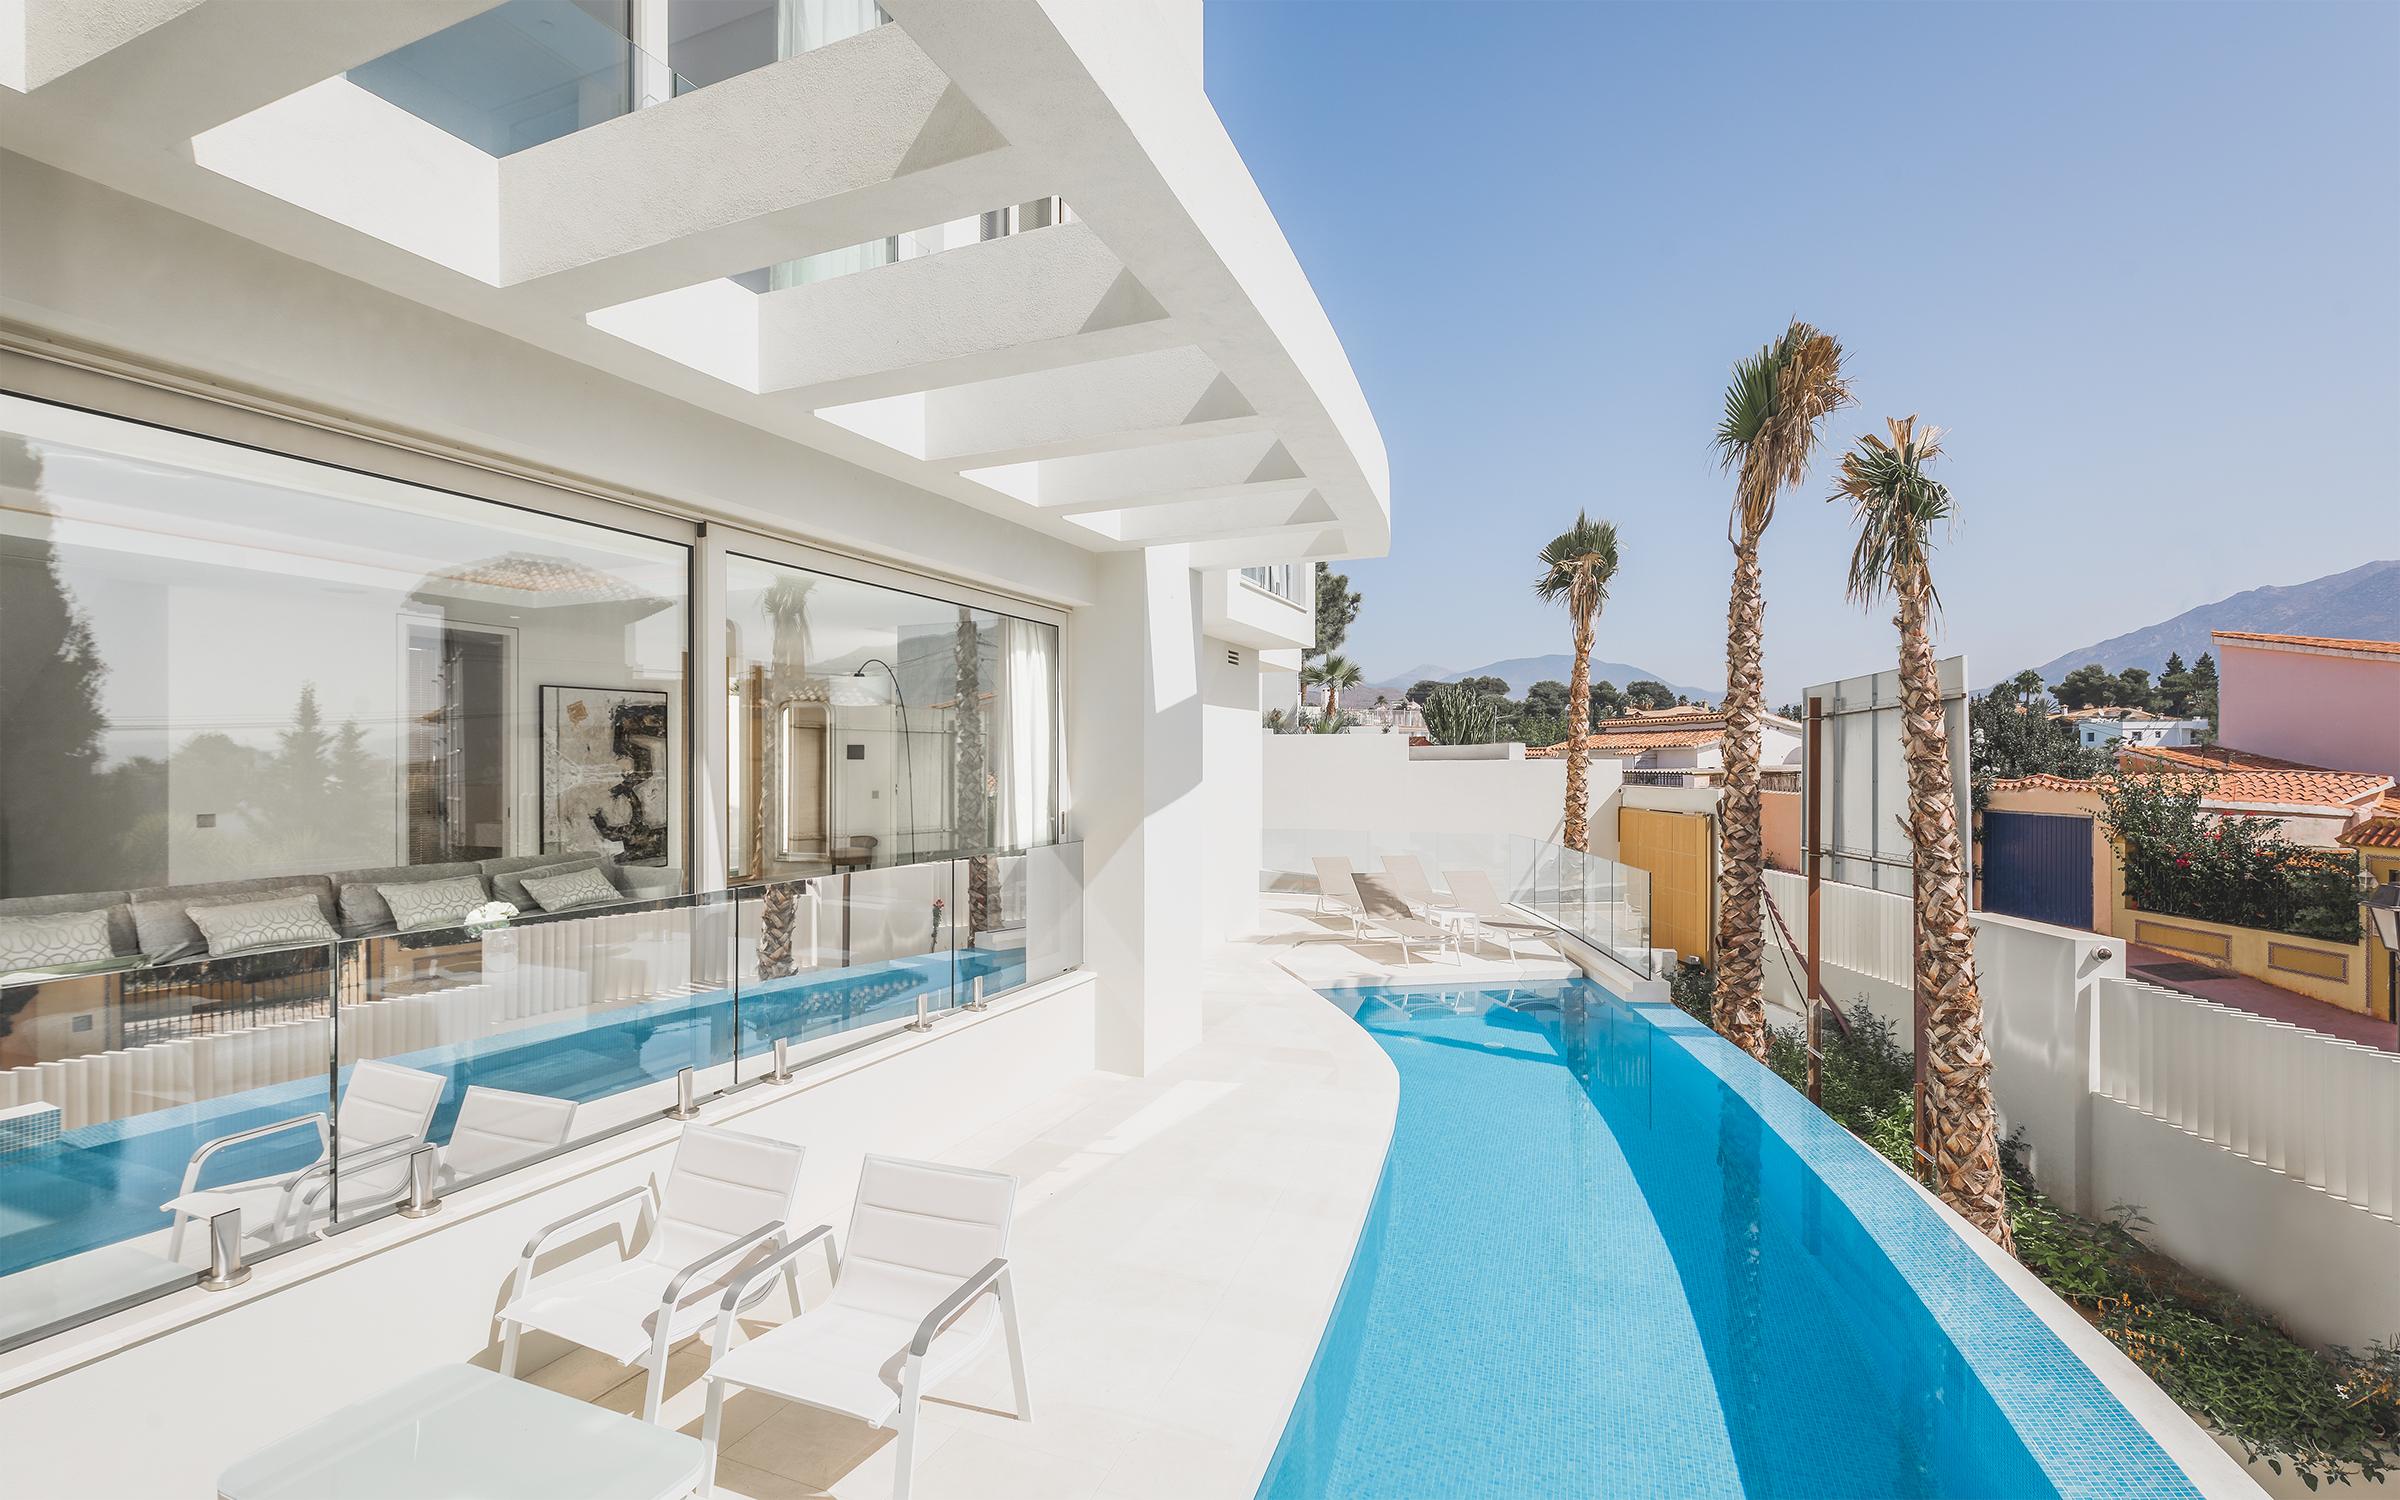 359-00115P: Villa in Marbella